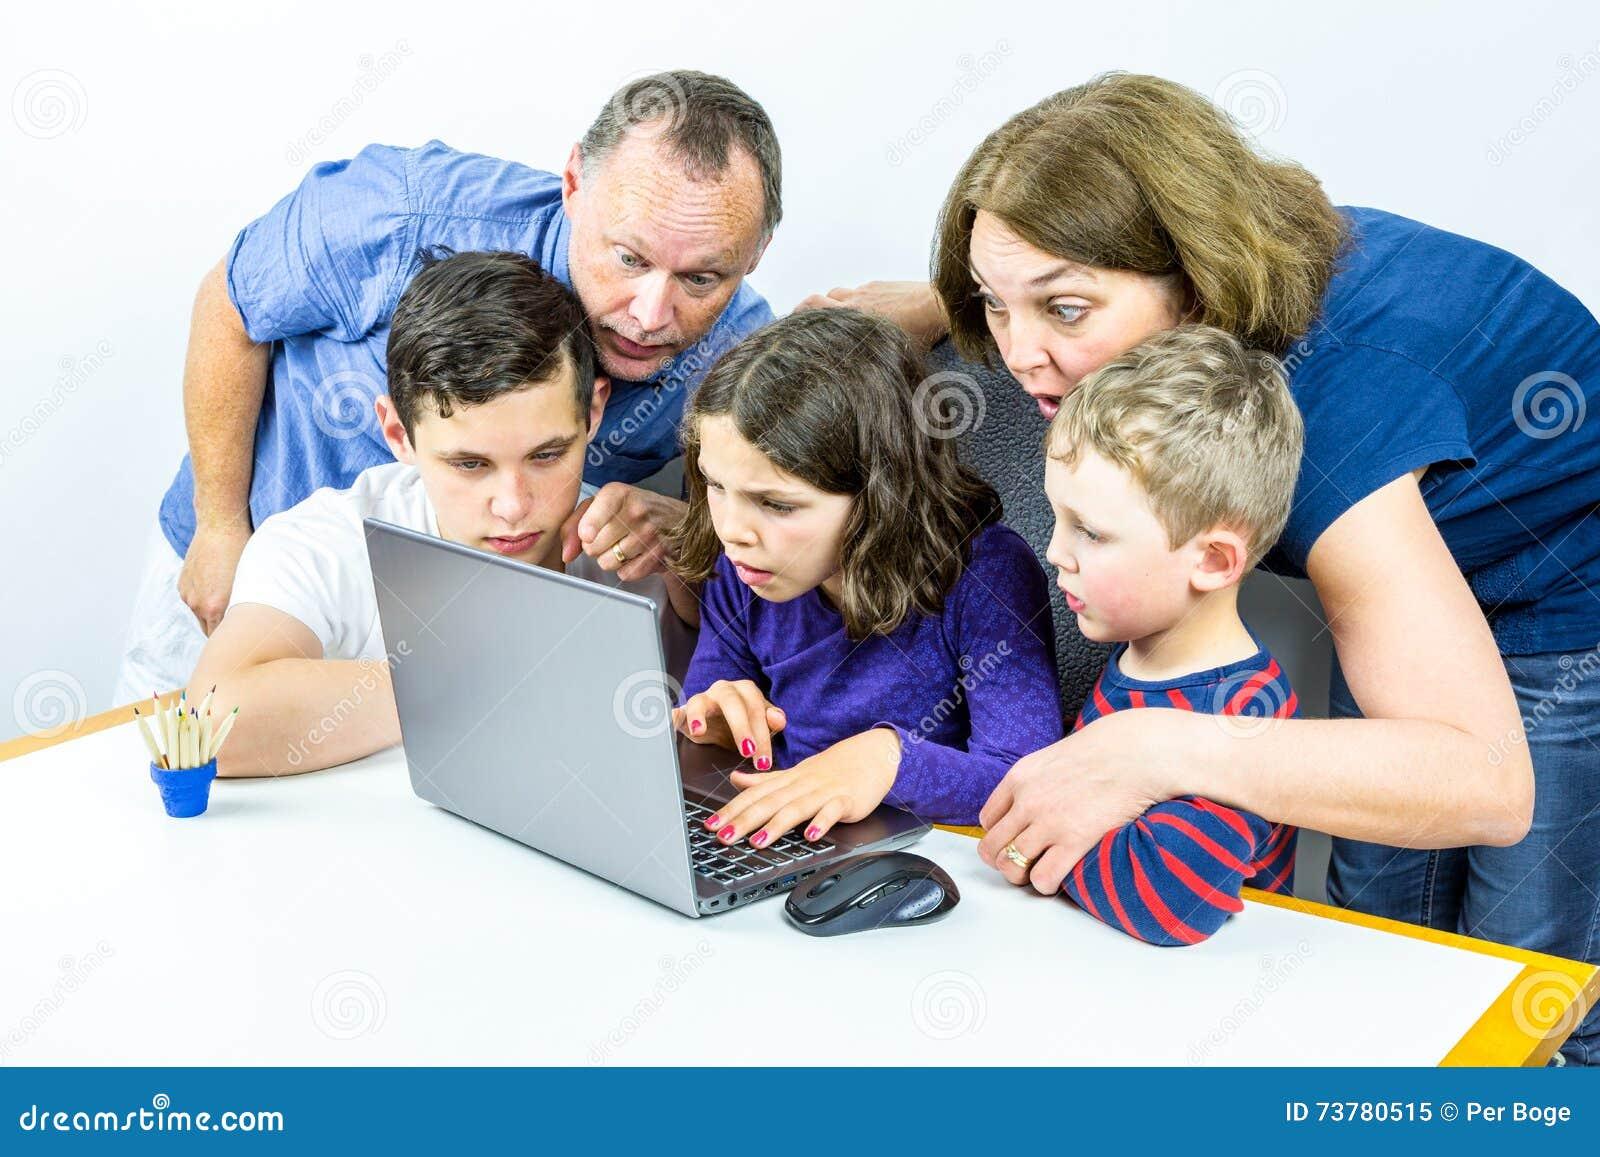 Family gathered around laptop looks at shocking content on internet, studio shot.